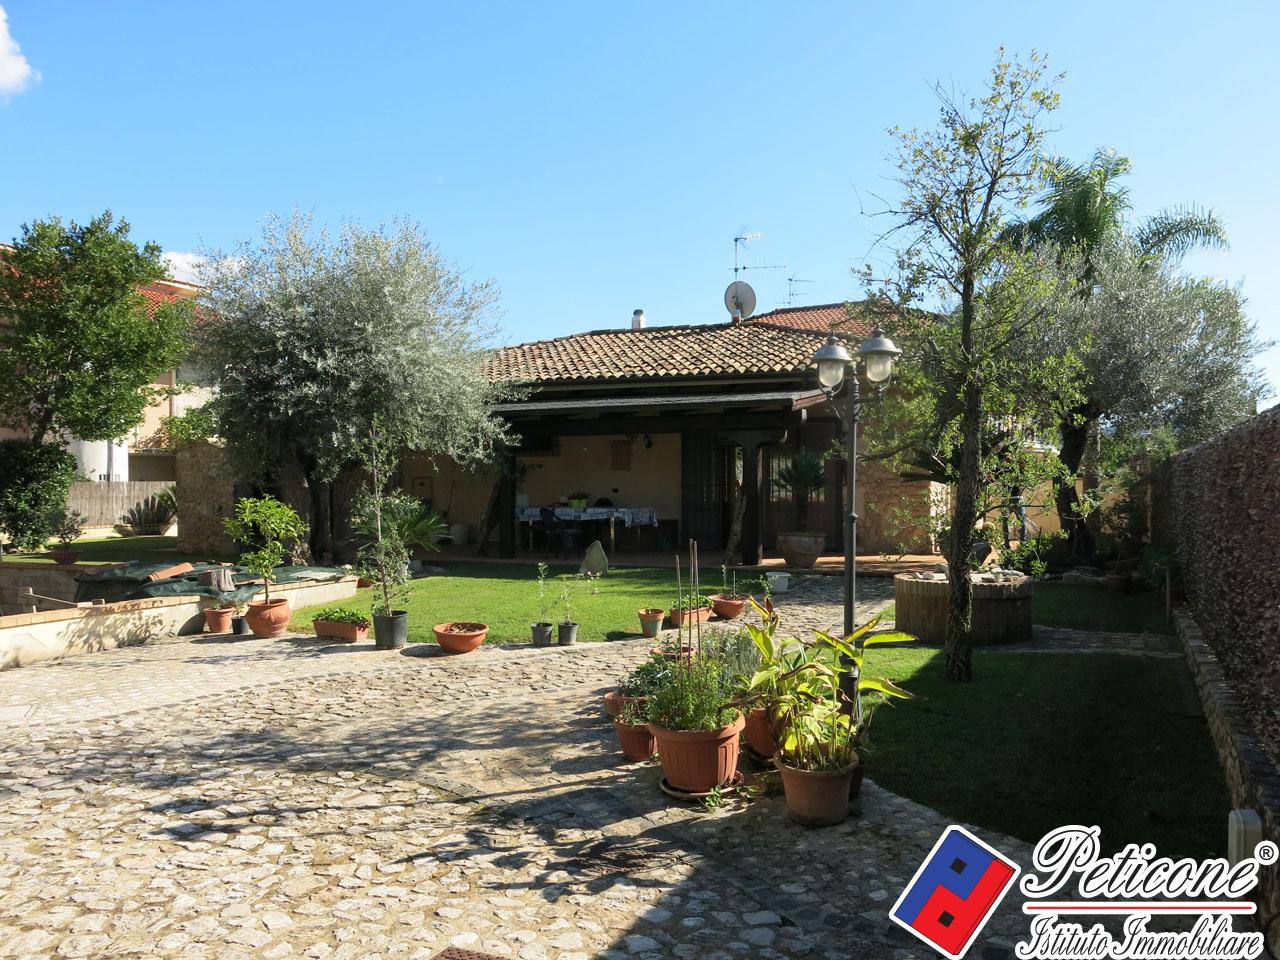 Villa in Vendita a Fondi: 3 locali, 107 mq - Foto 2